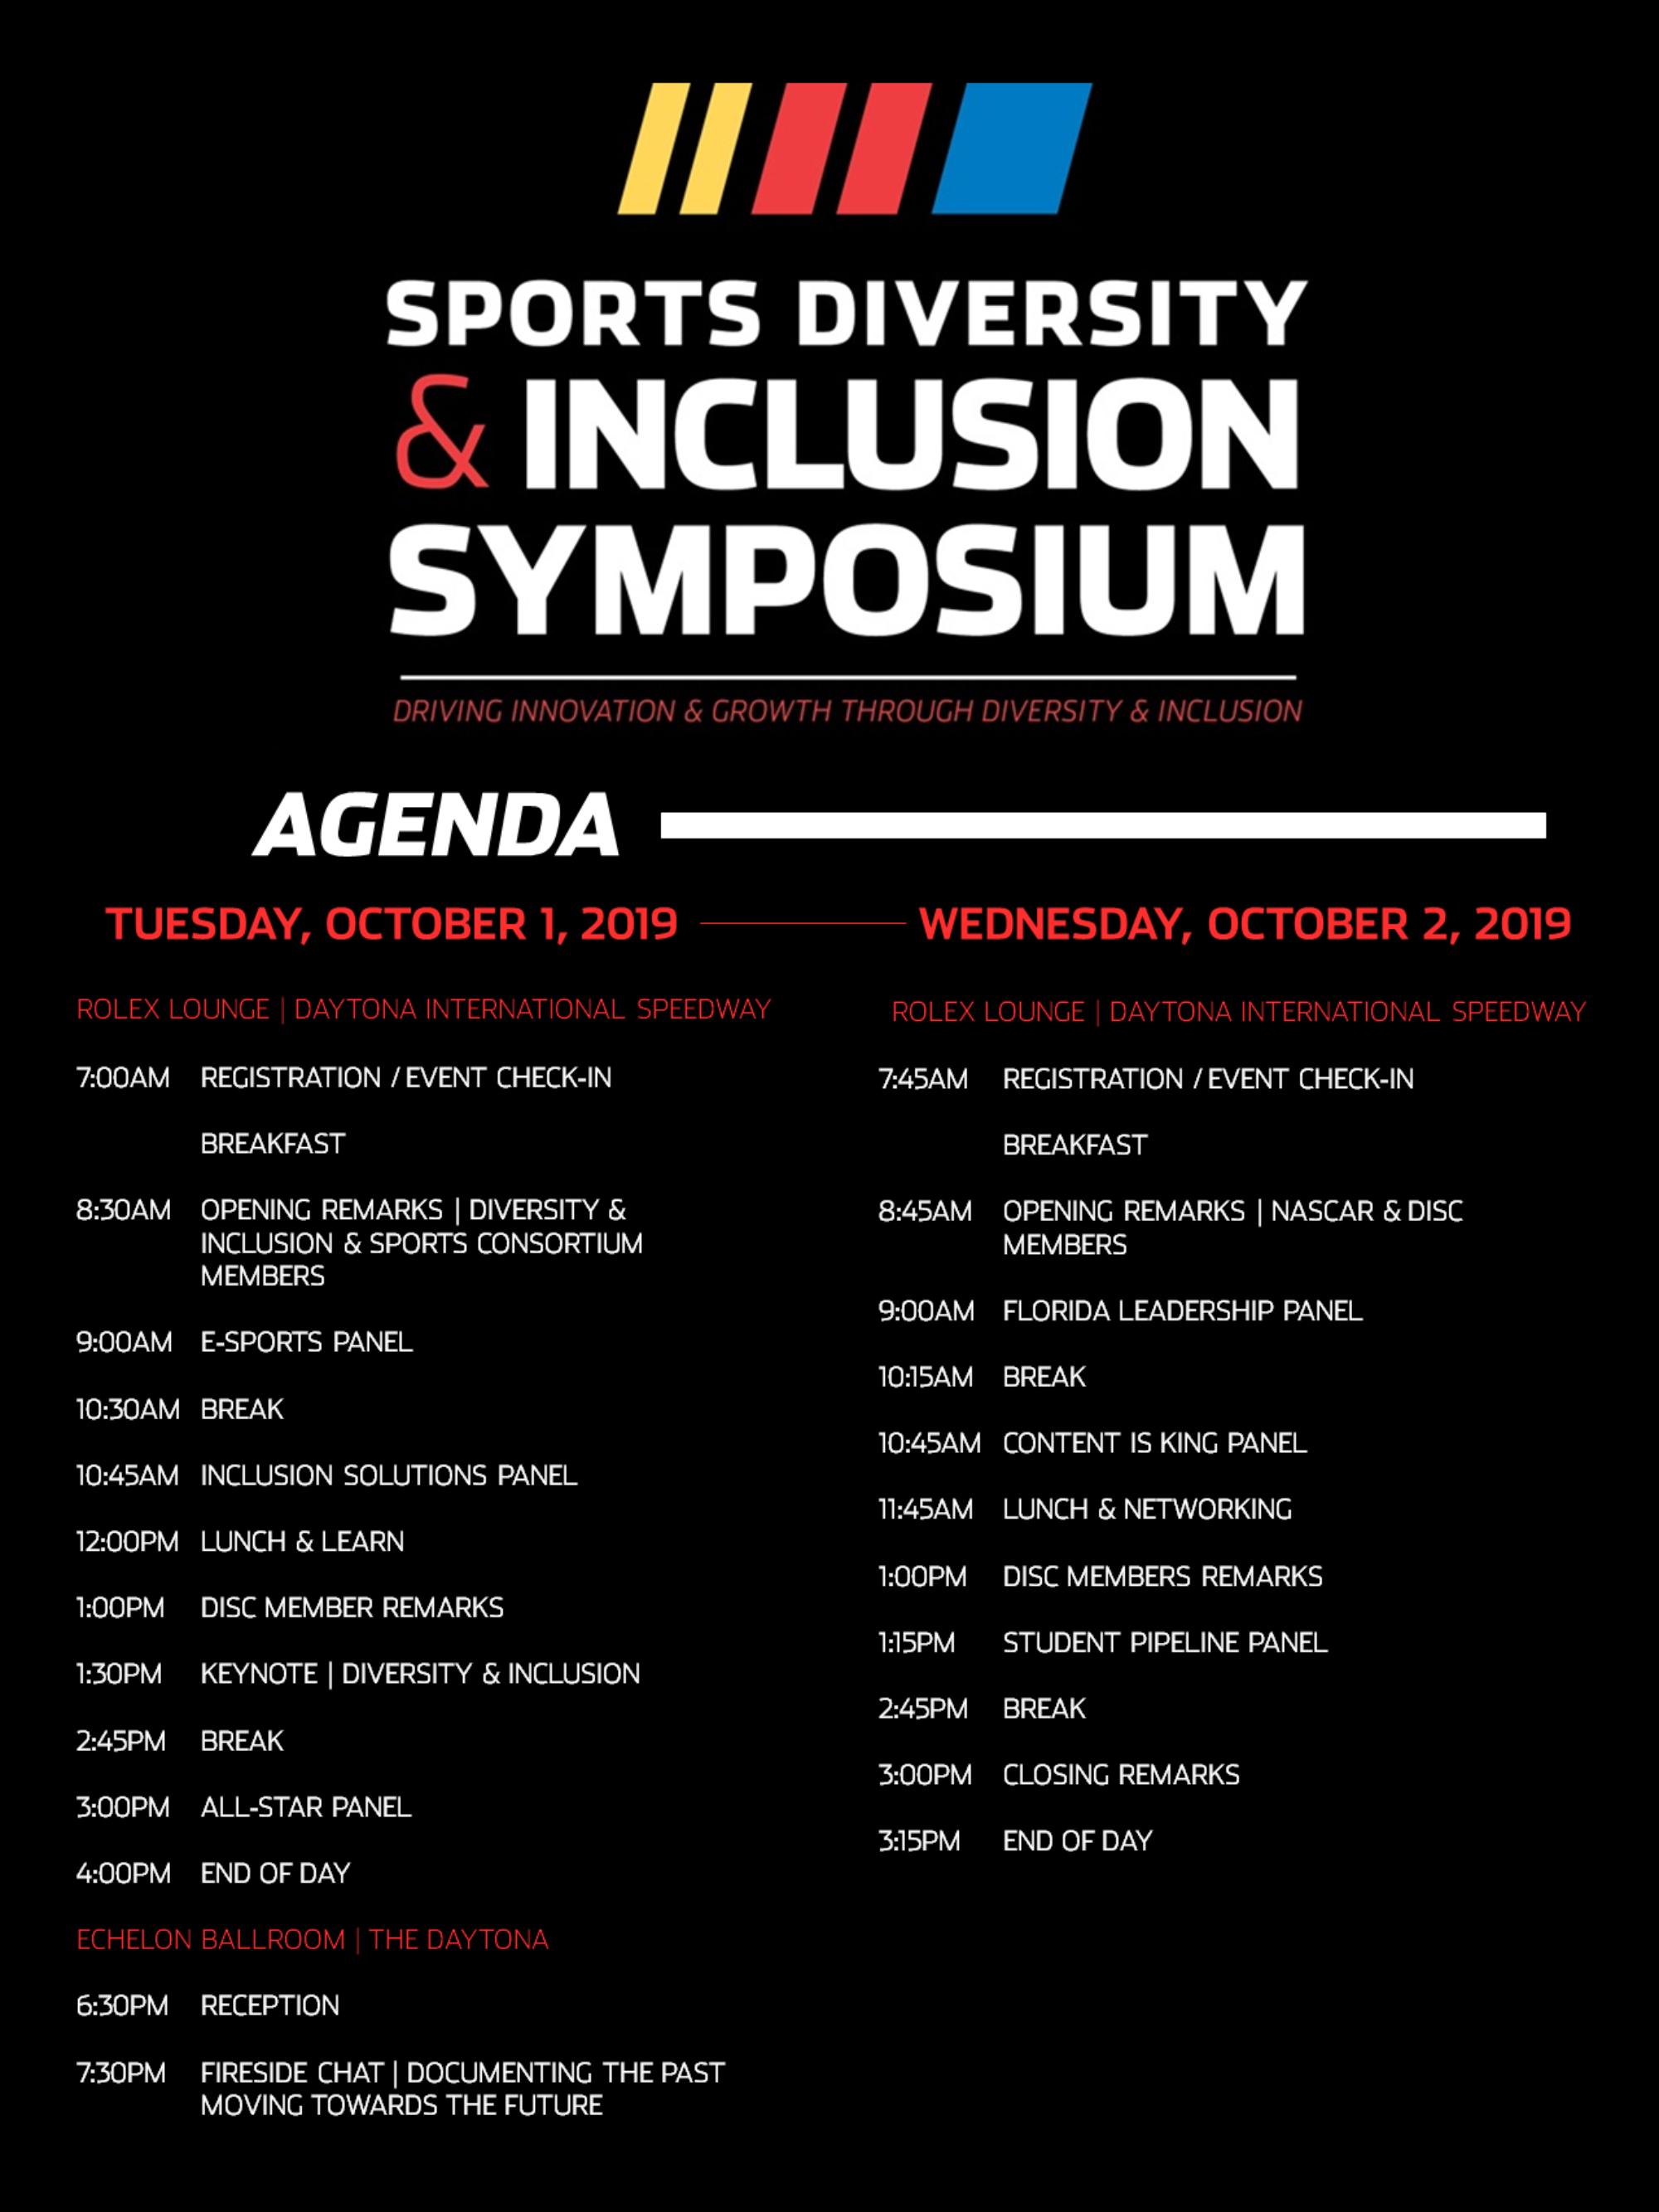 Sports Diversity & Inclusion Symposium